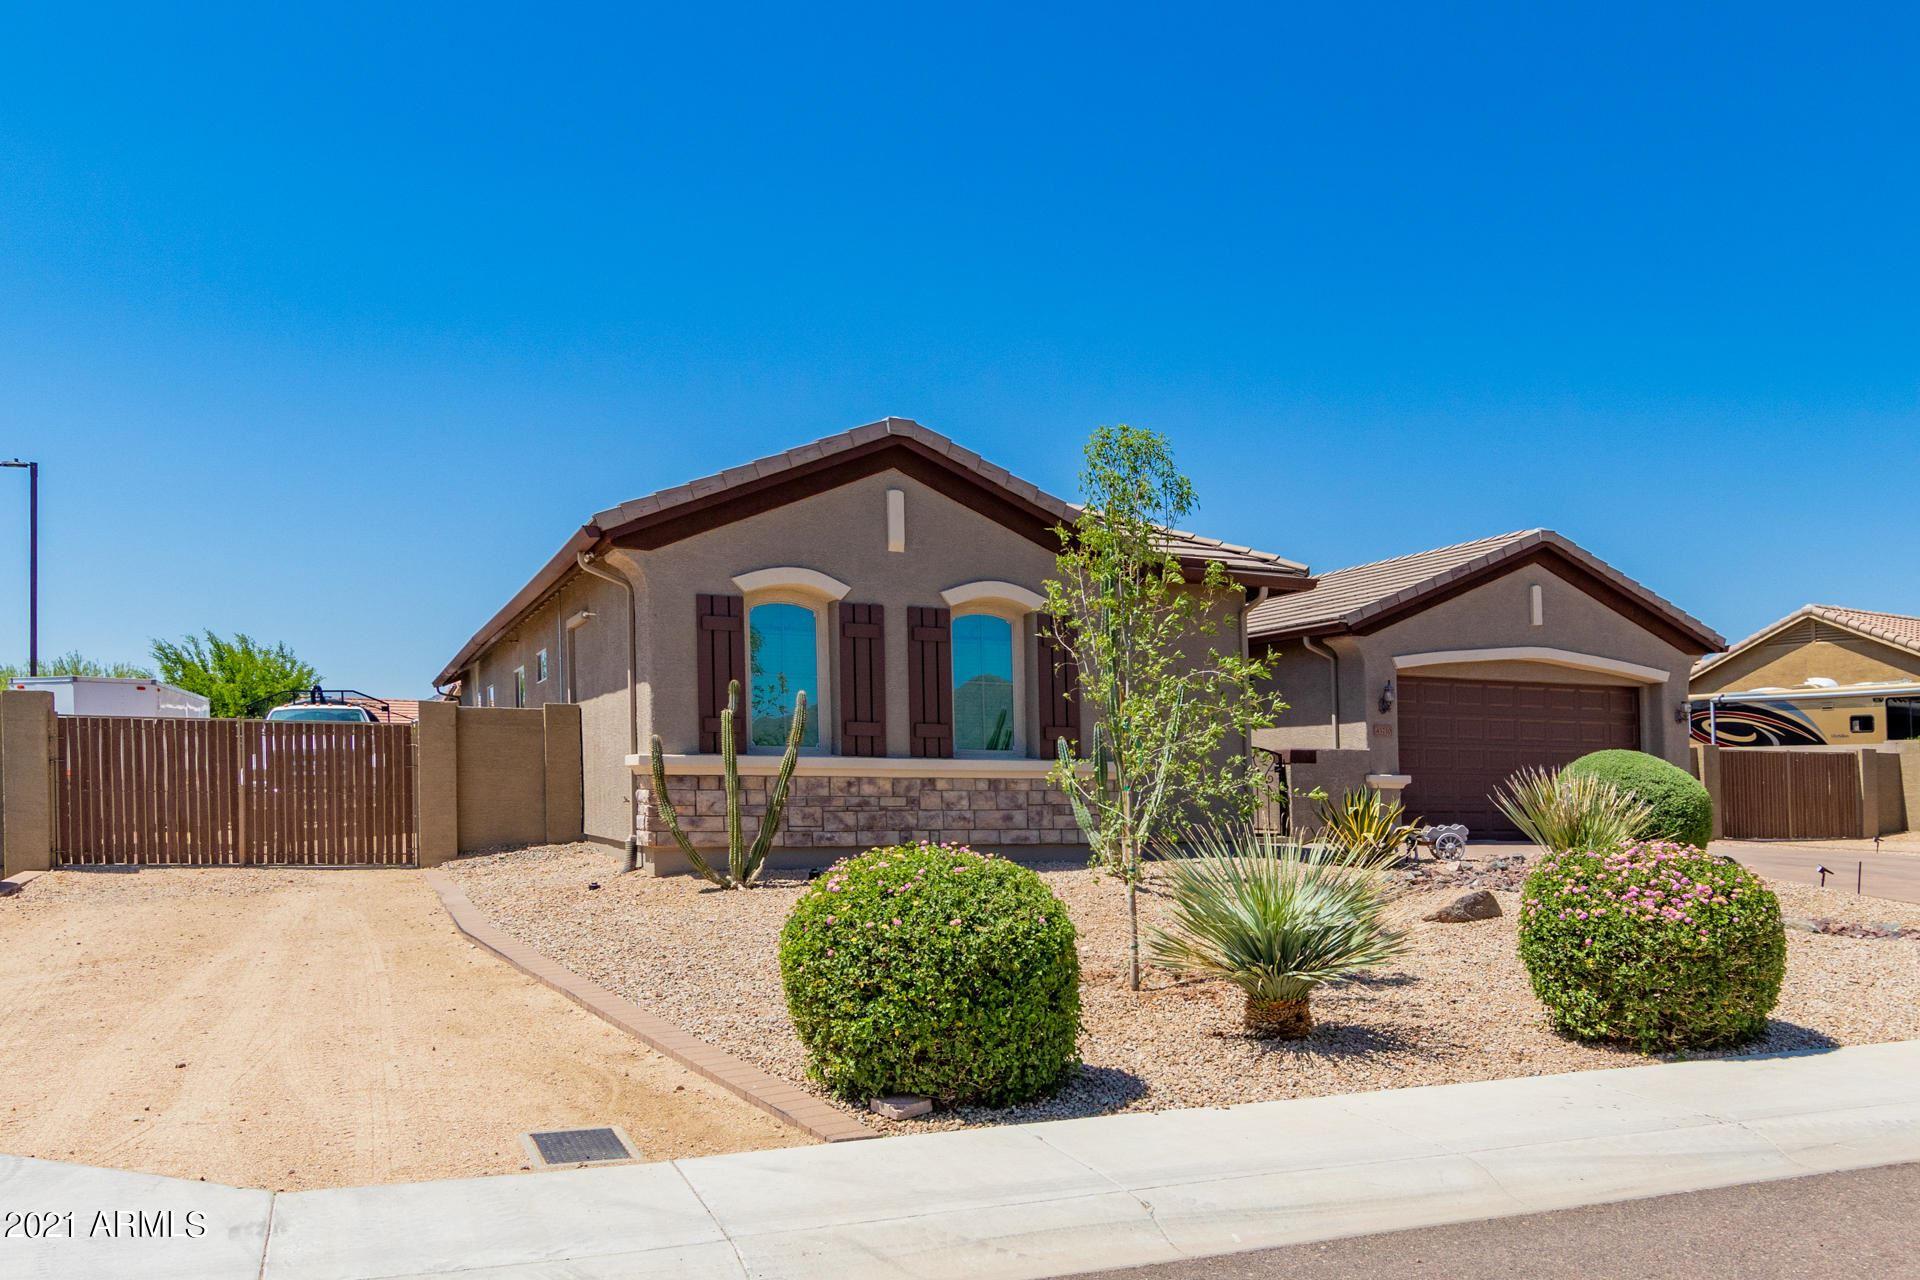 Photo of 43710 N 47TH Drive, New River, AZ 85087 (MLS # 6223593)